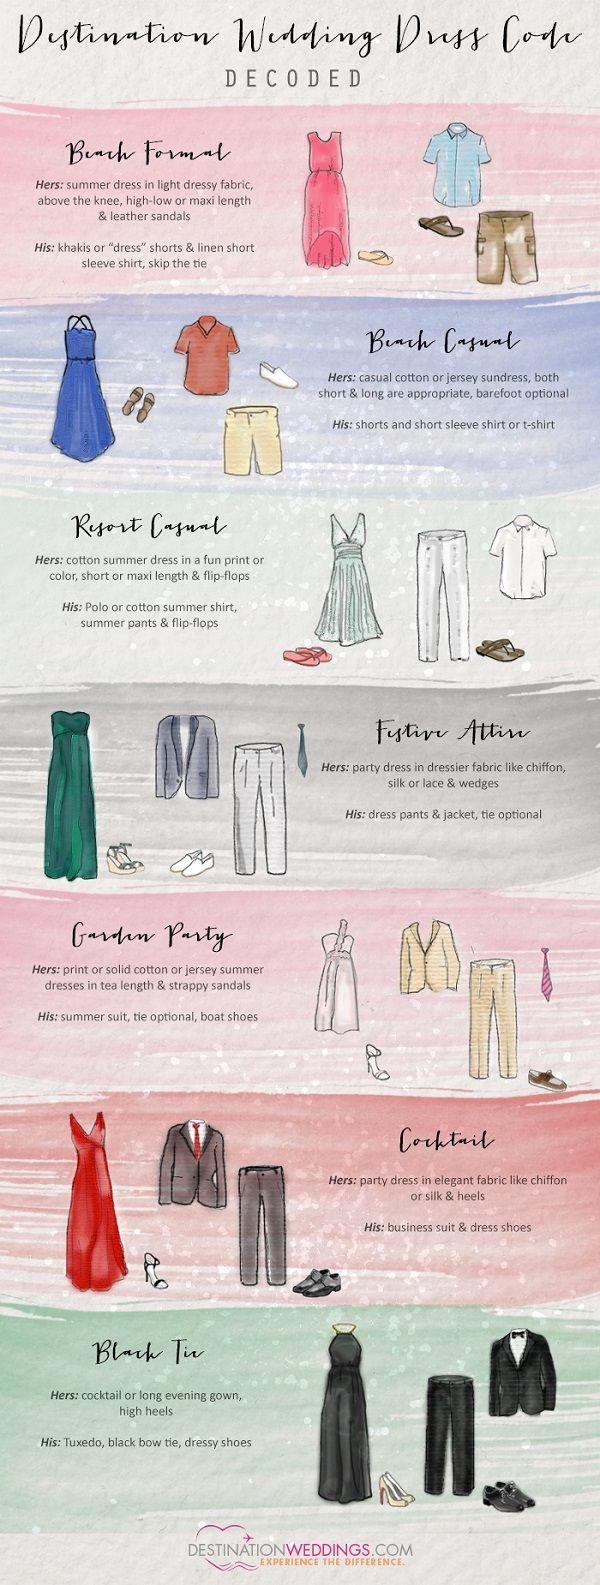 destination wedding dresses Destination Wedding Dress Code Decoded